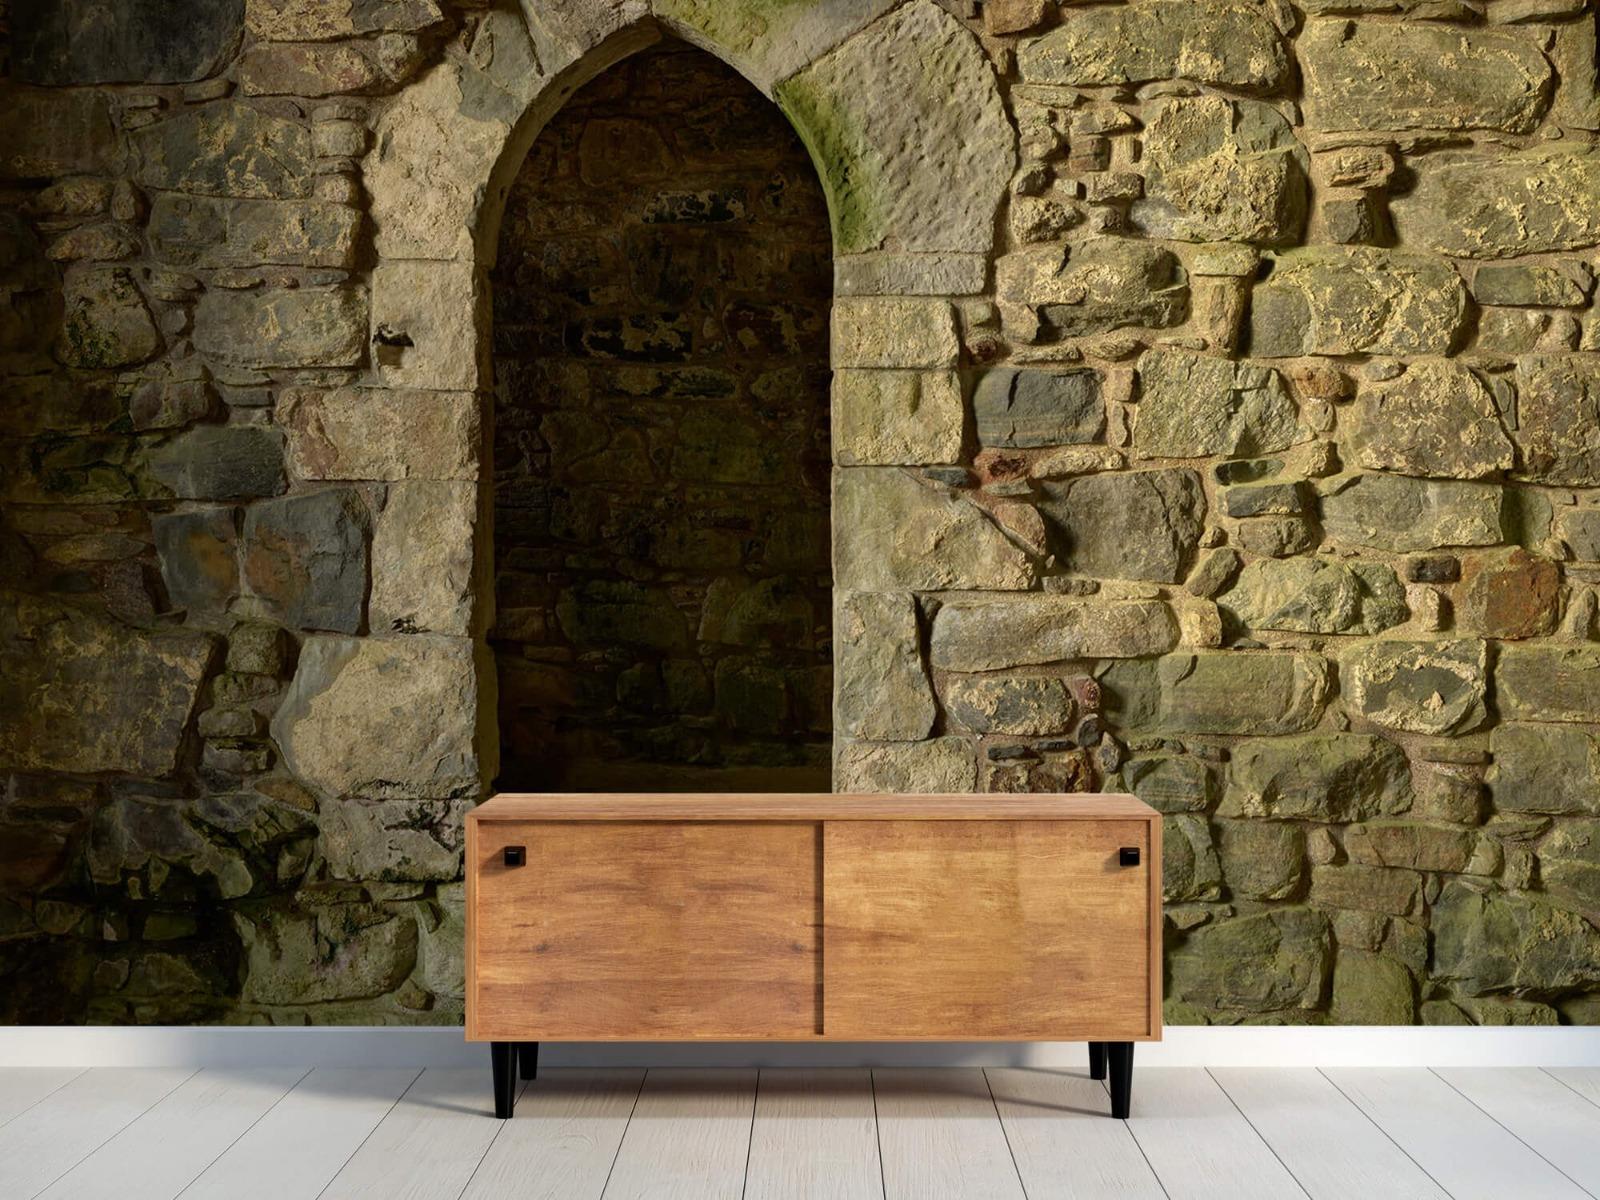 Steen behang - Oude muur met doorgang - Slaapkamer 10